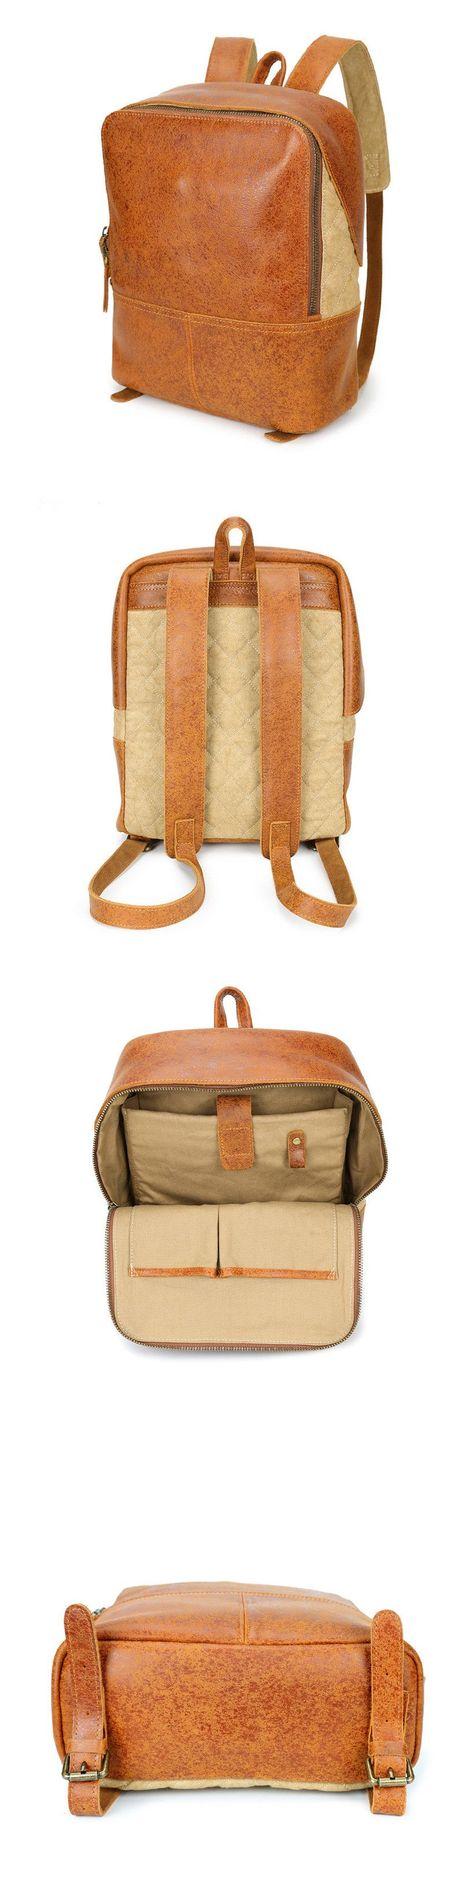 6f44f6a419 School Backpack Handmade Leather Backpack Travel Backpack Men Backpack  YD8173